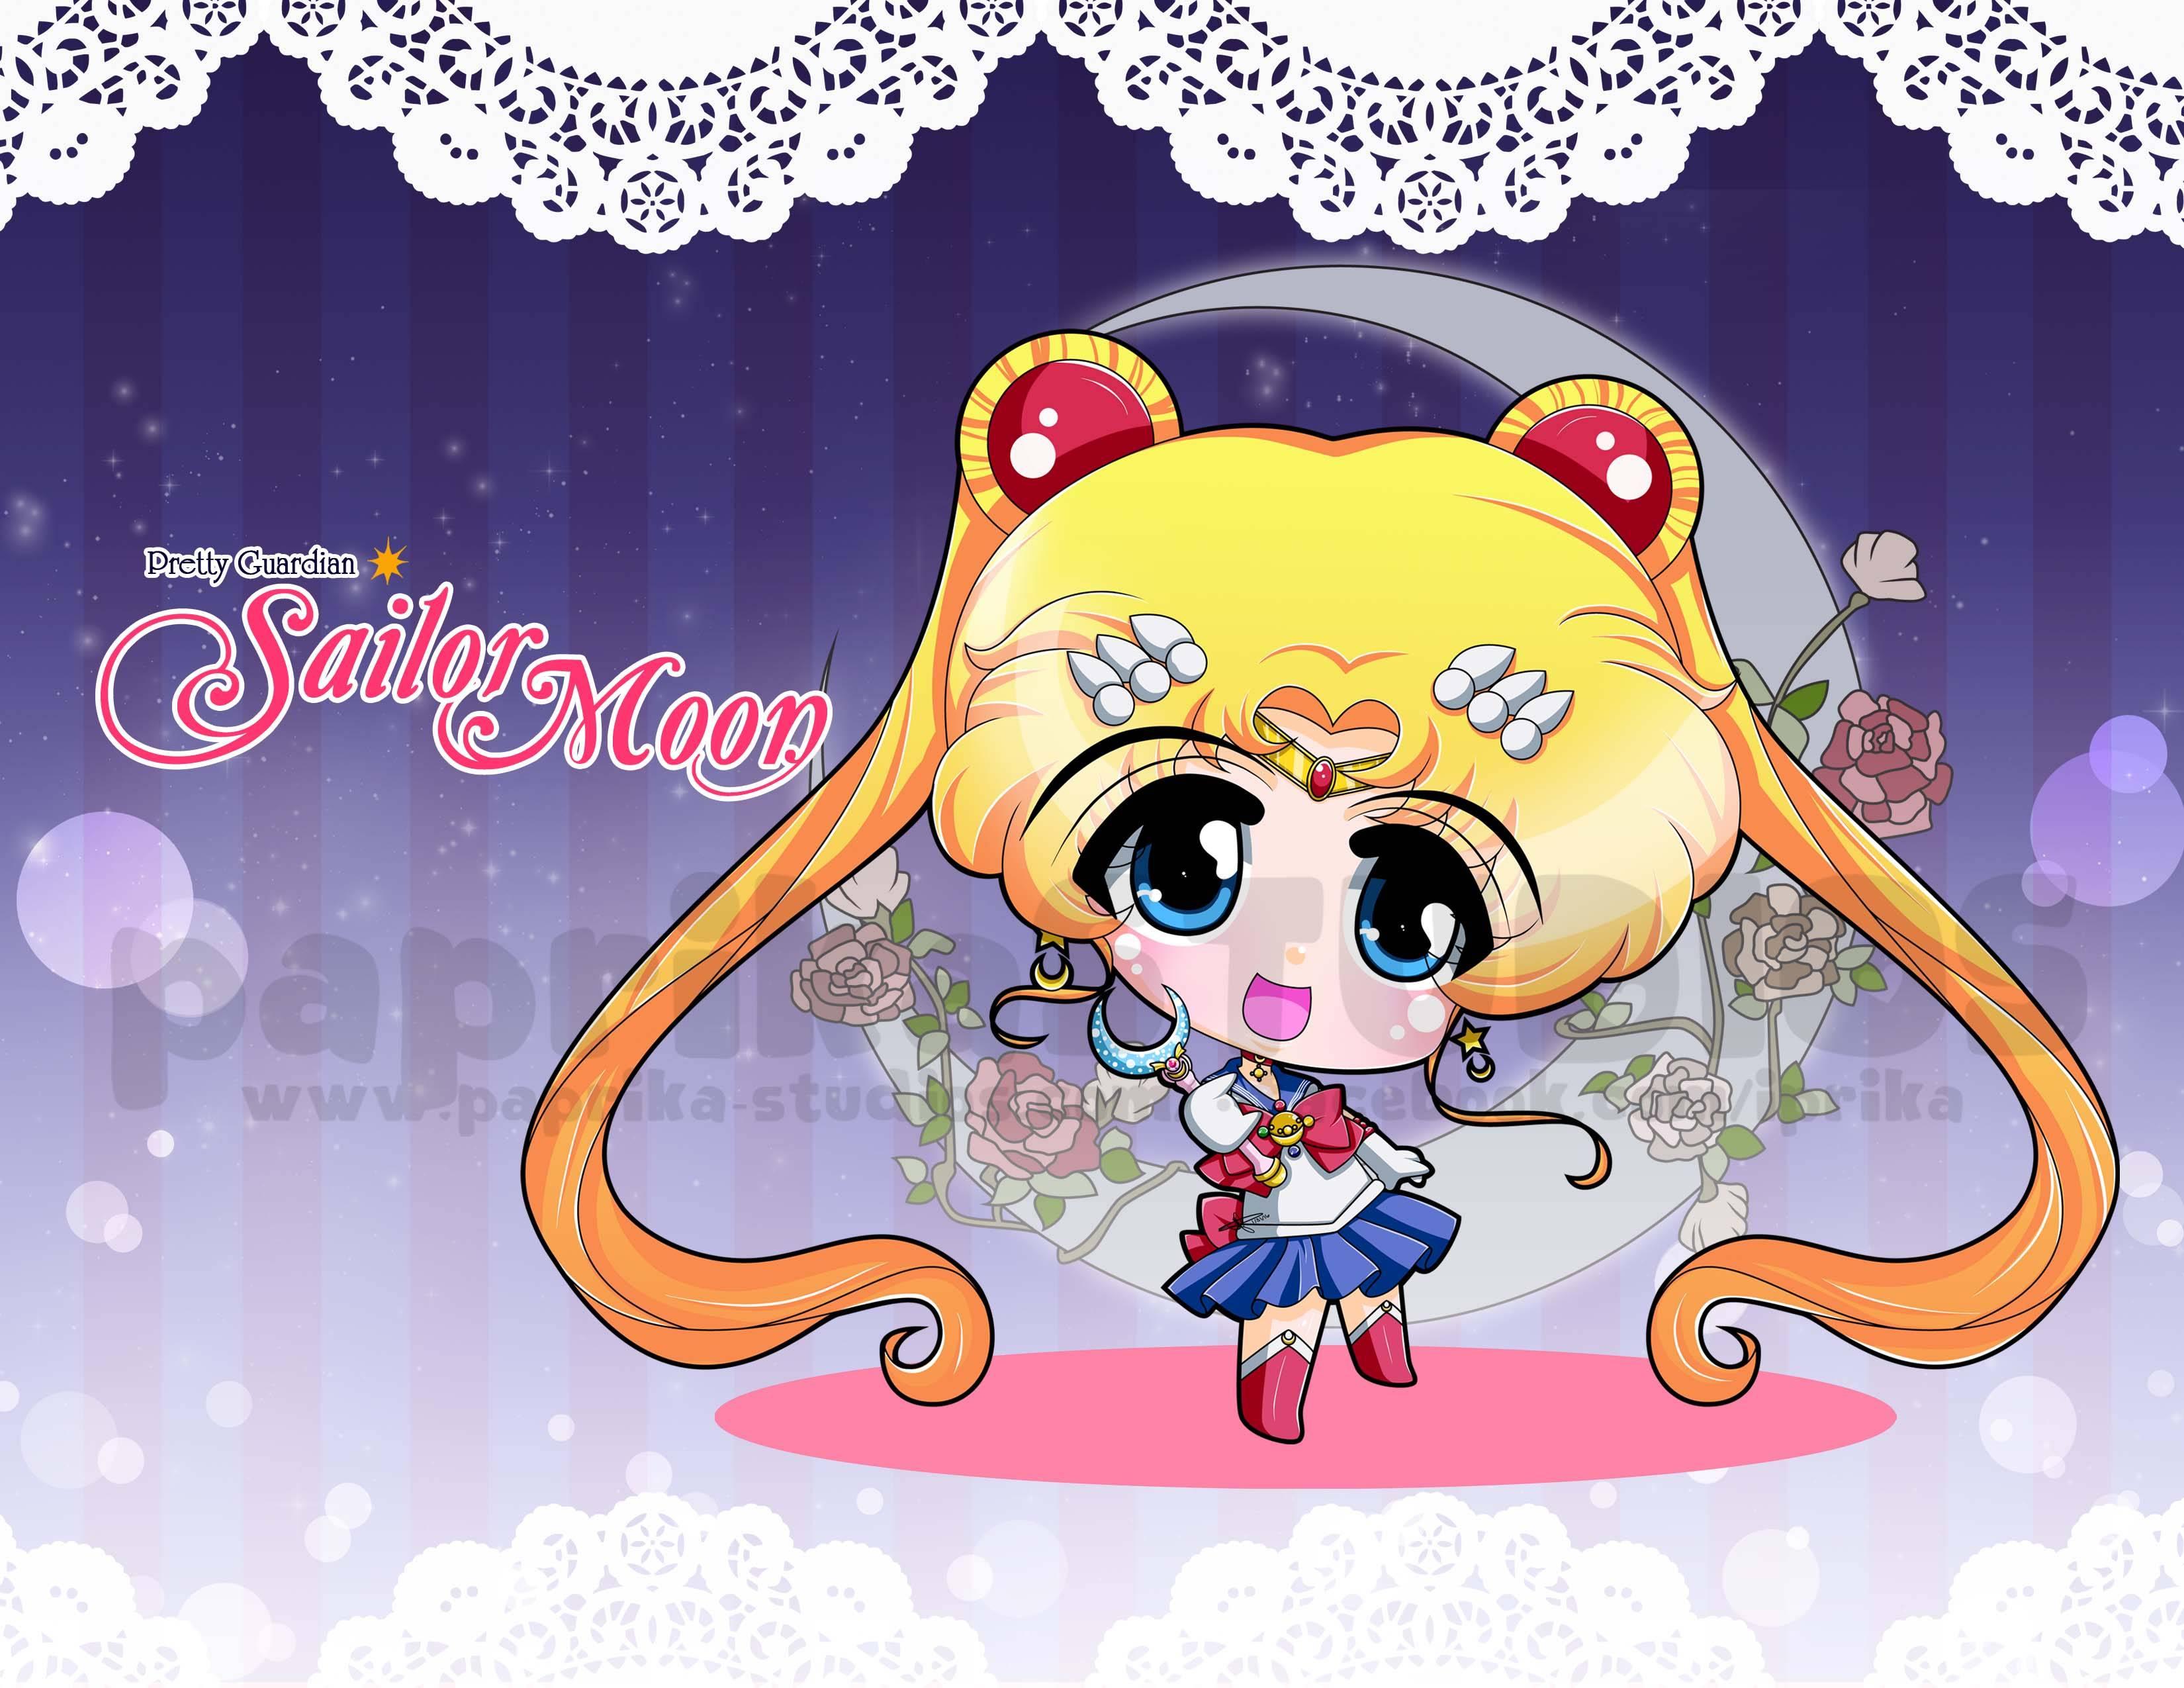 Chibi Sailor Moon (Crystal)